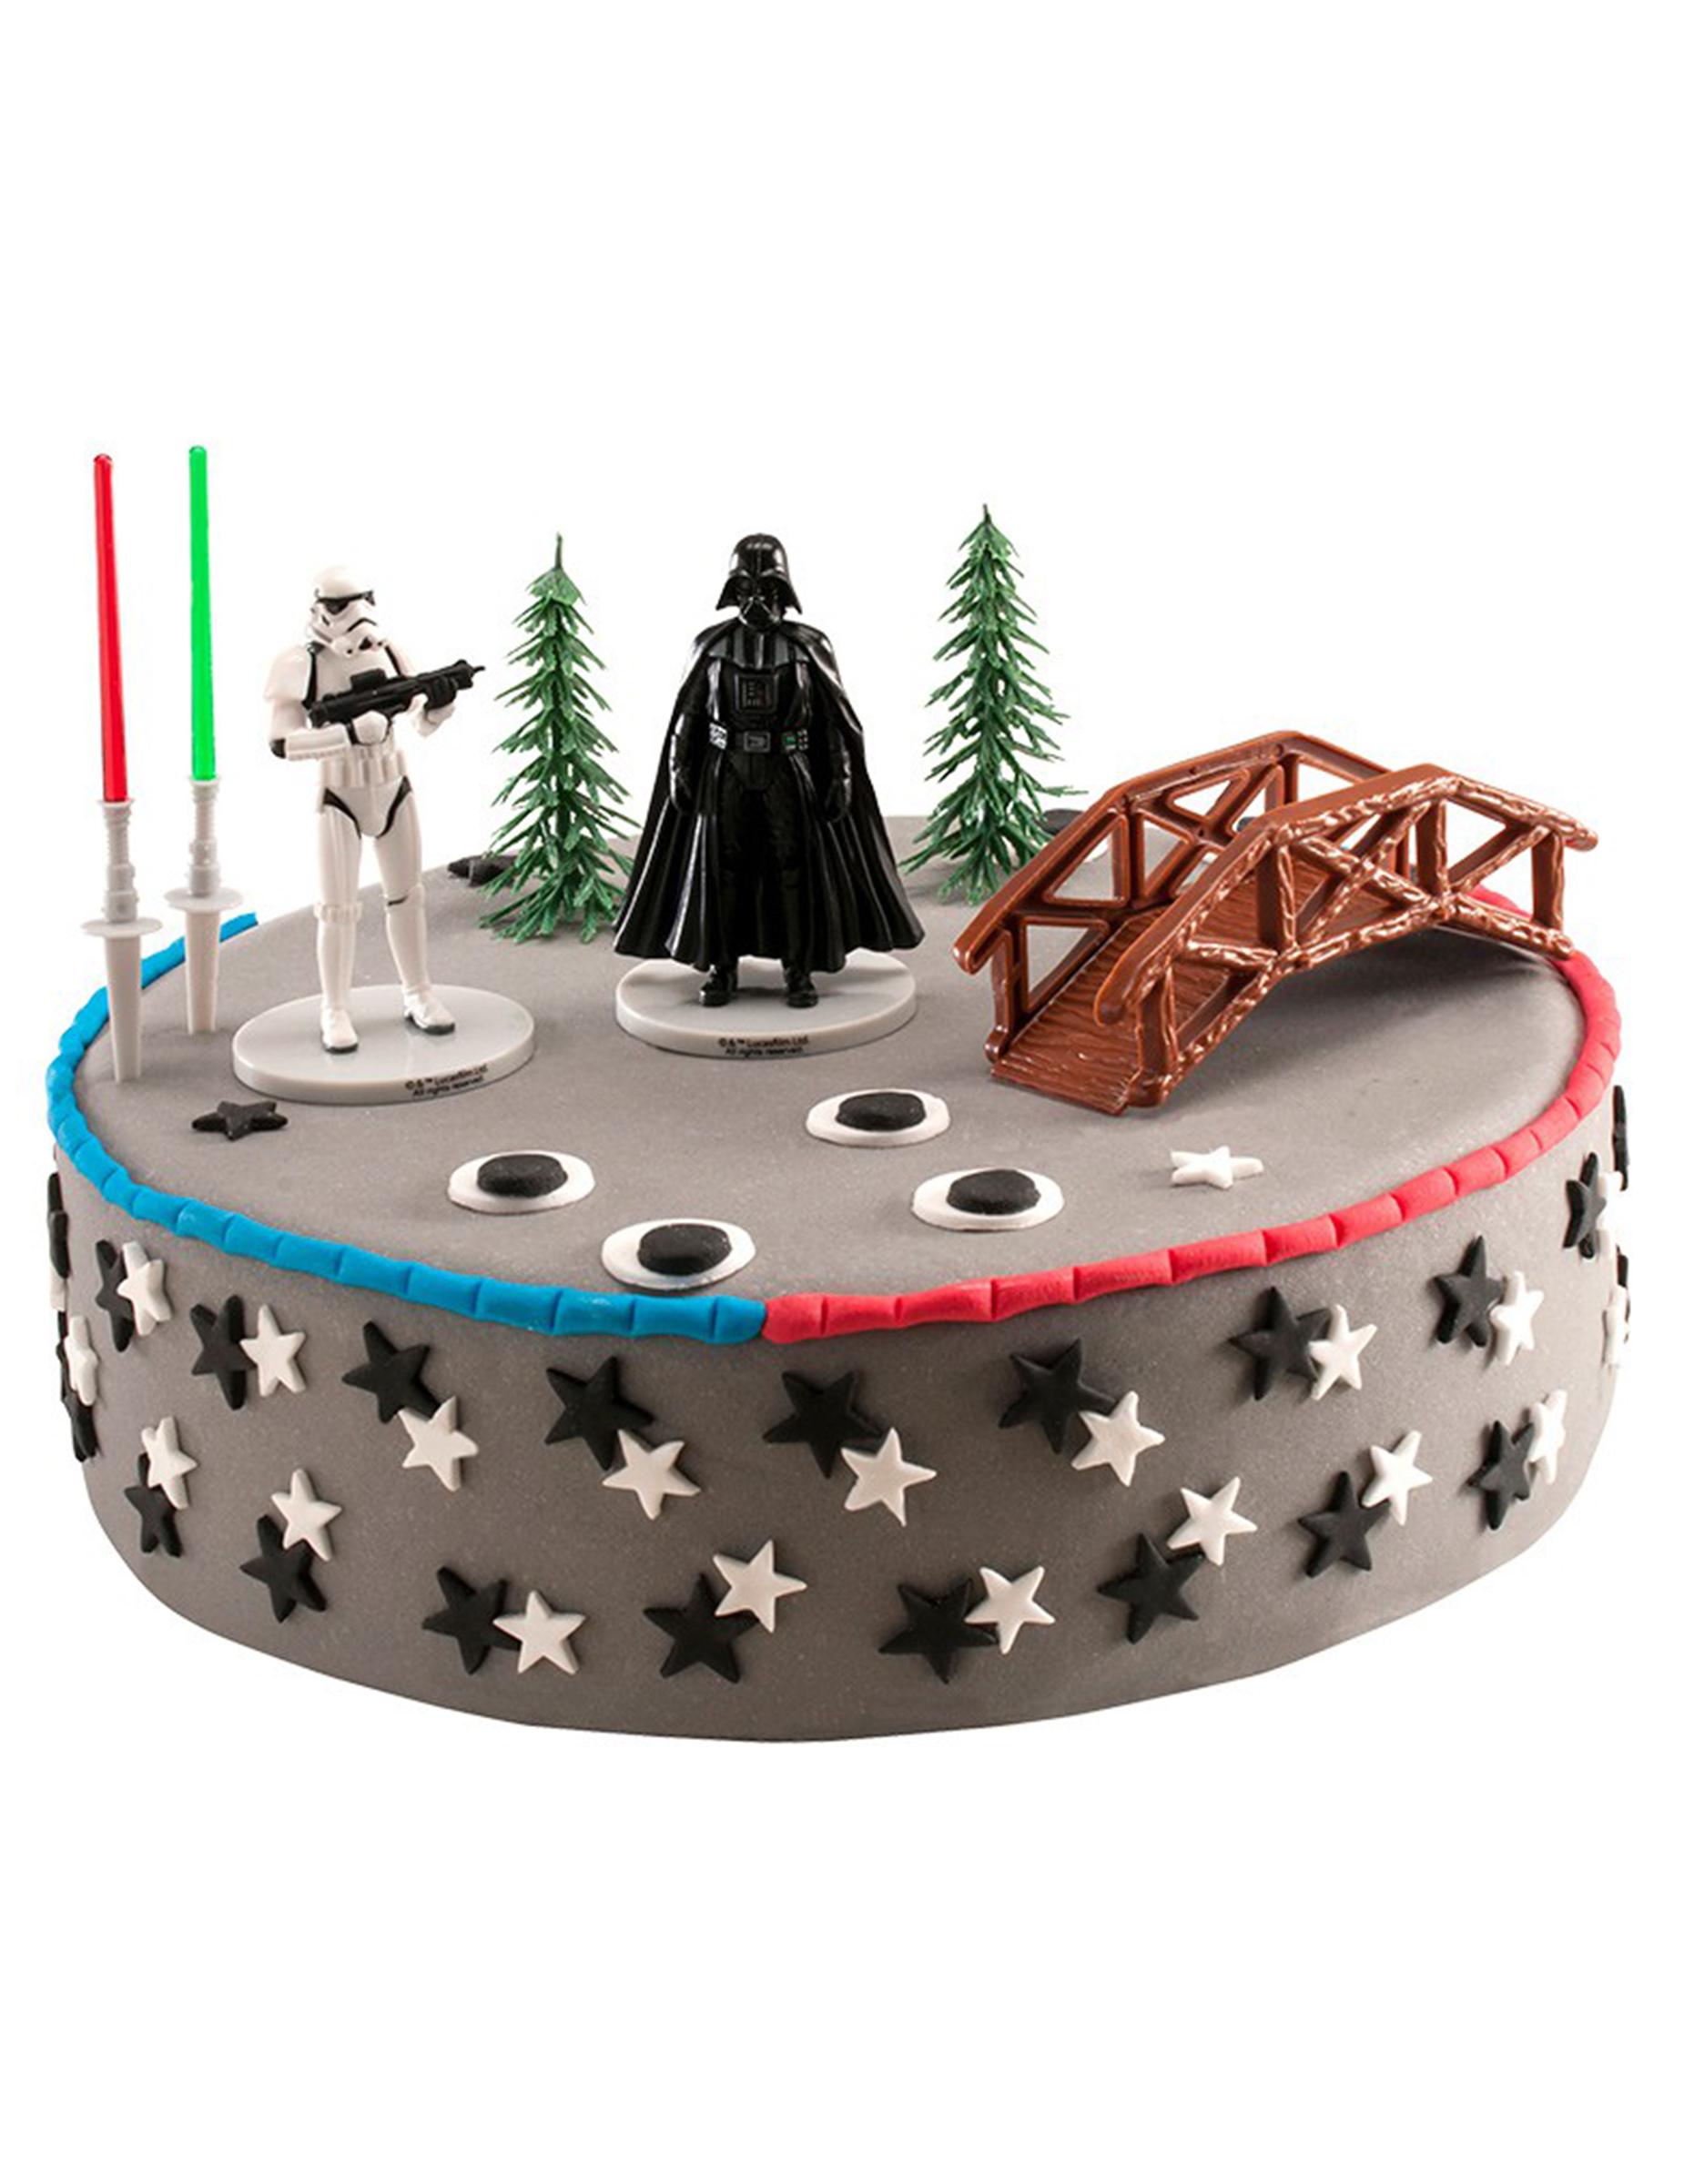 d corations g teaux star wars deguise toi achat de decoration animation. Black Bedroom Furniture Sets. Home Design Ideas